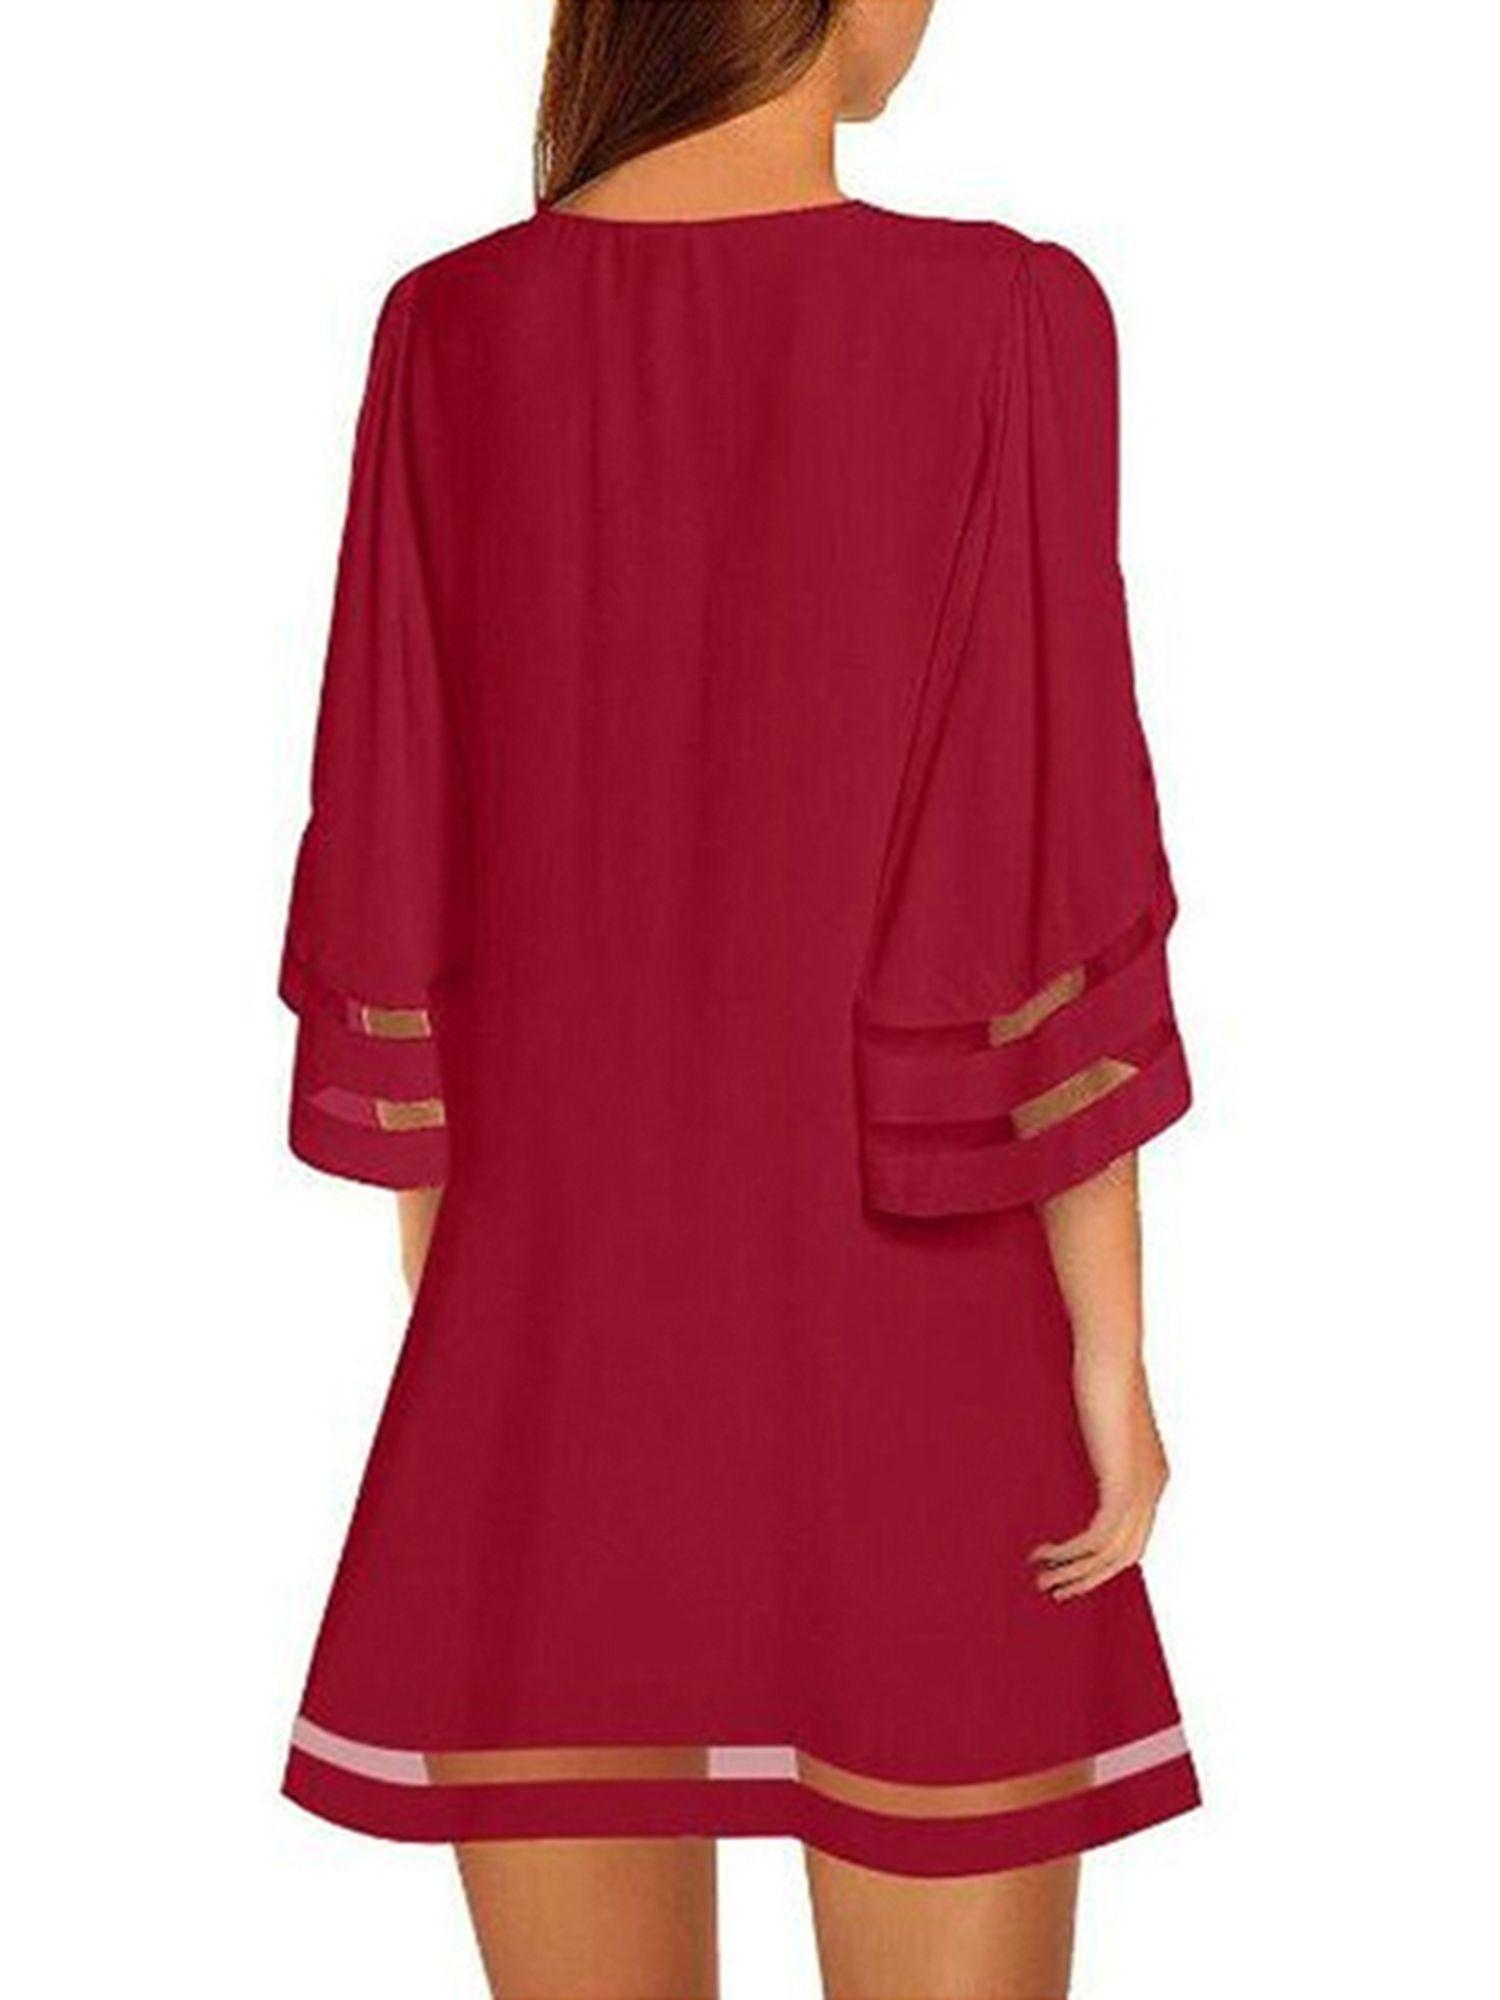 Tunic Dresses For Women V Neck Mesh Panel Blouse 3//4 Bell Sleeve Loose Top Shirt Dress